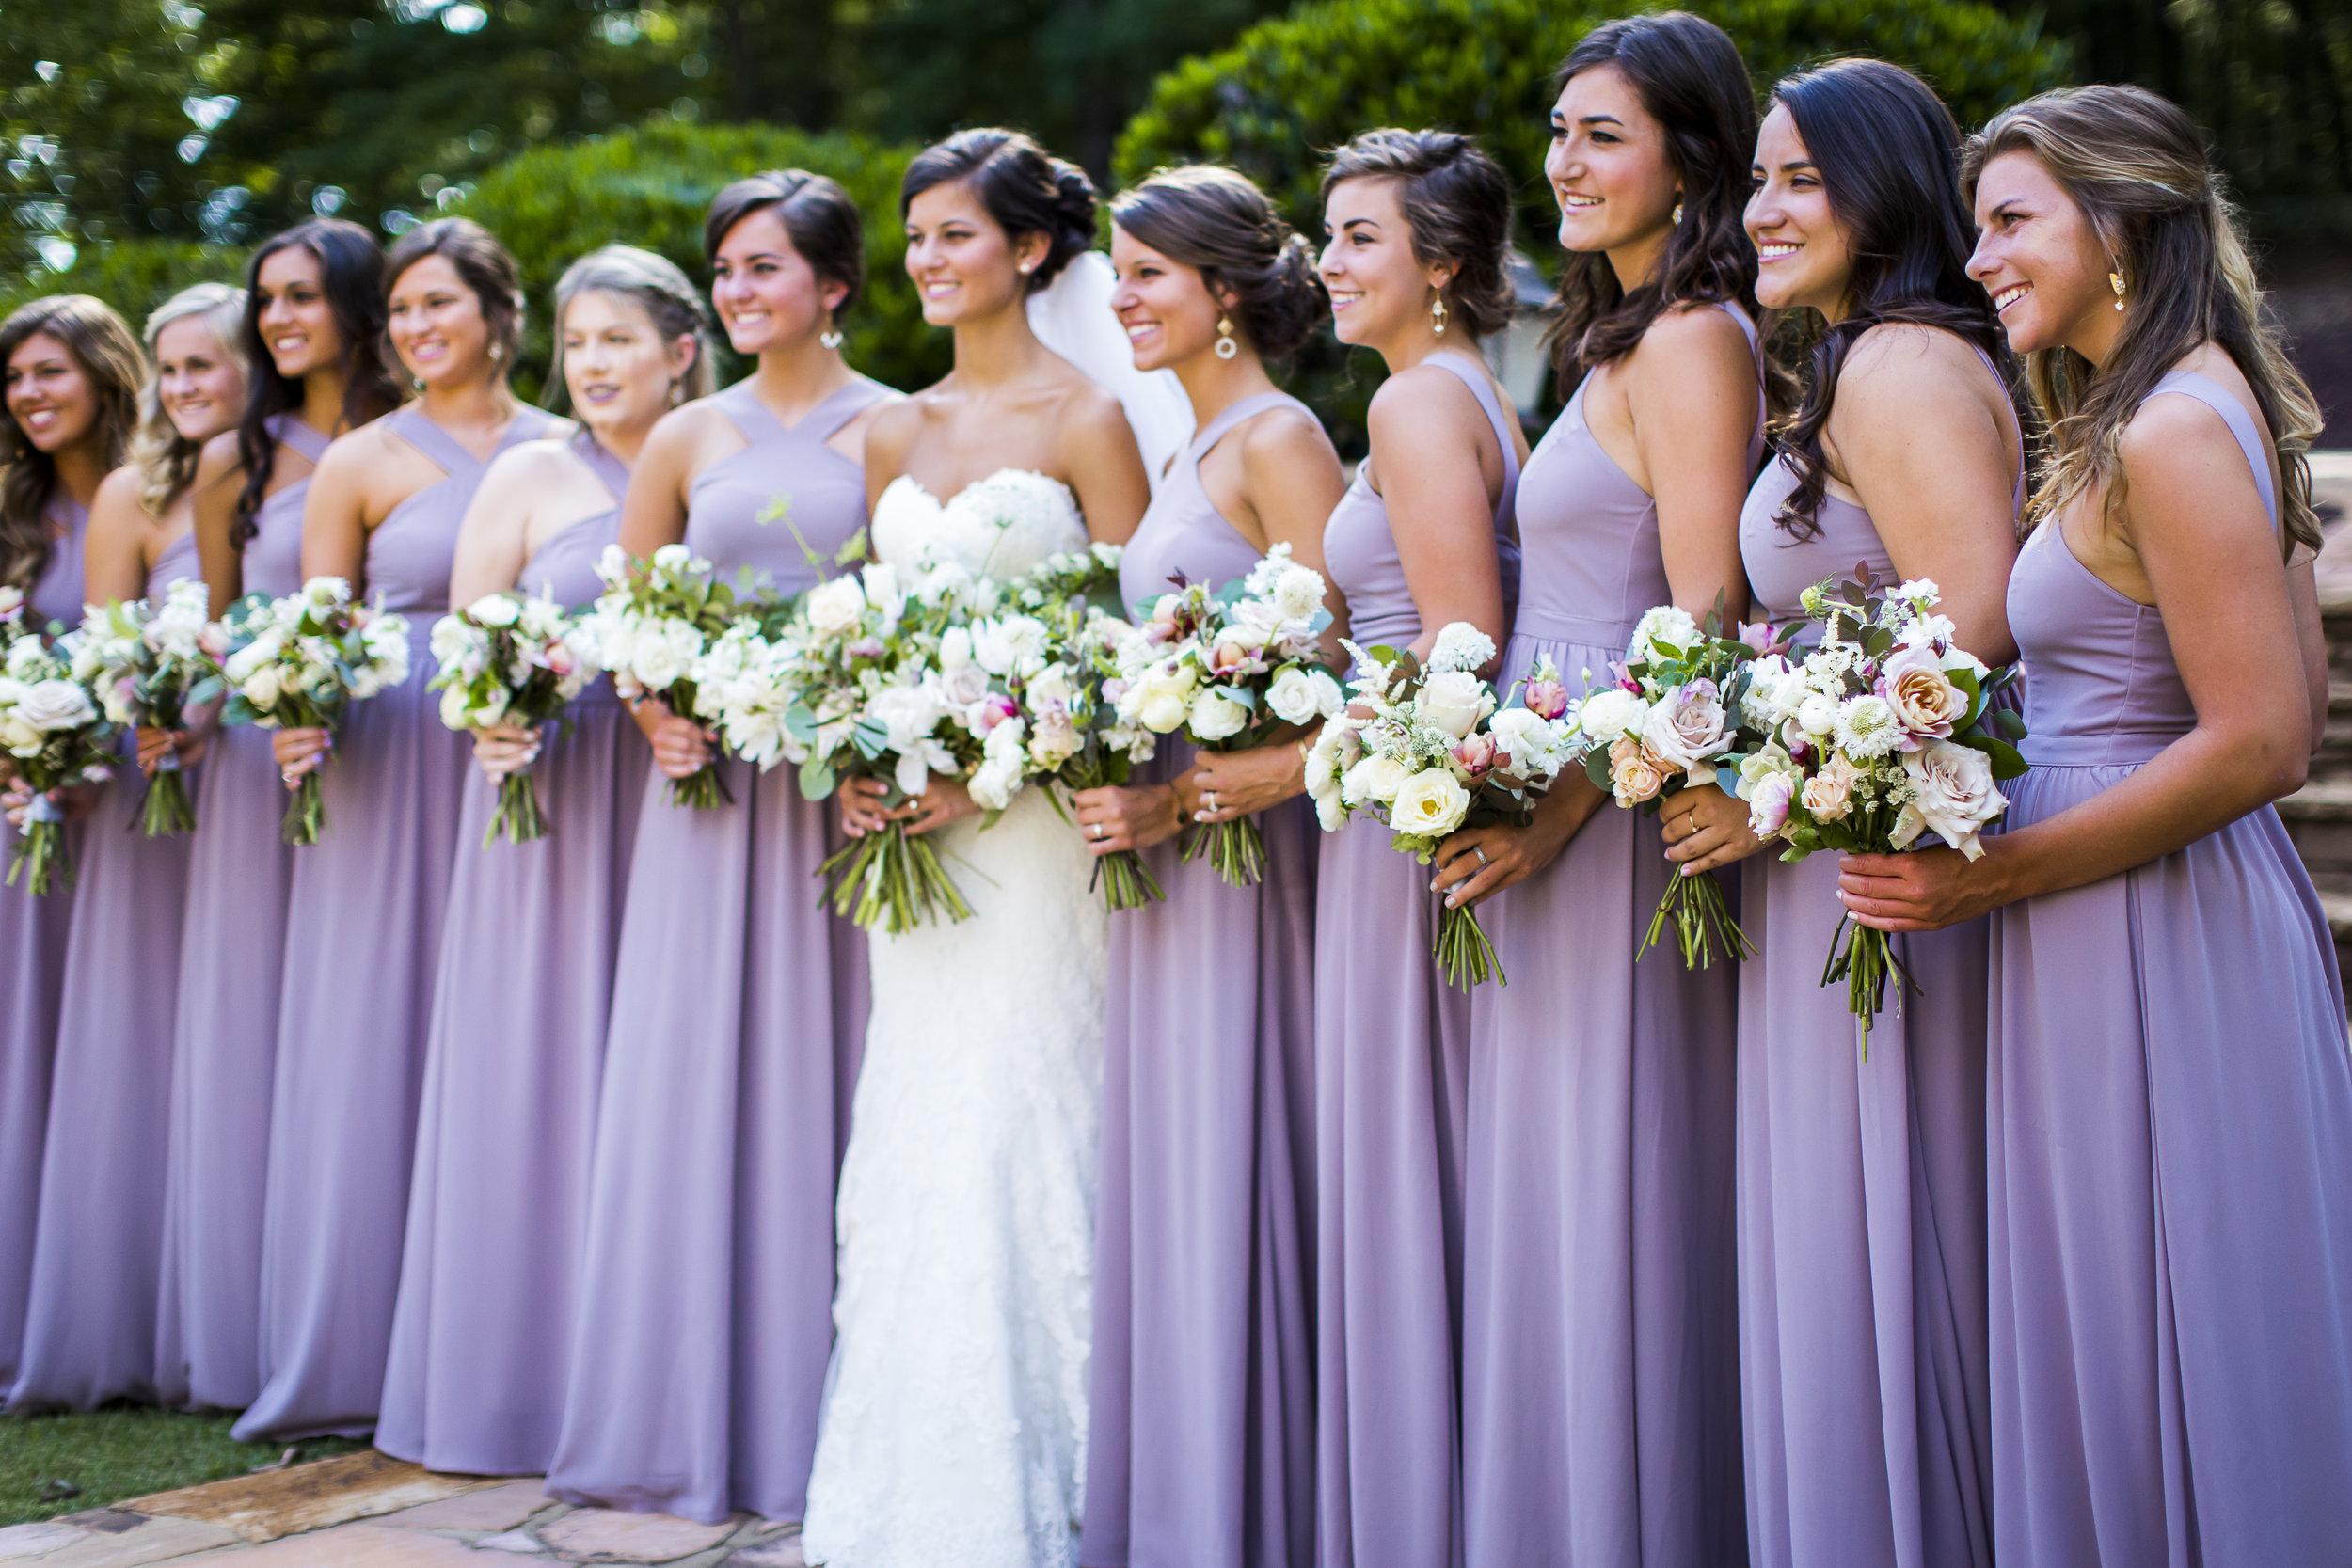 Perkins Wedding-137-(ZF-9700-01748-1-001).jpg